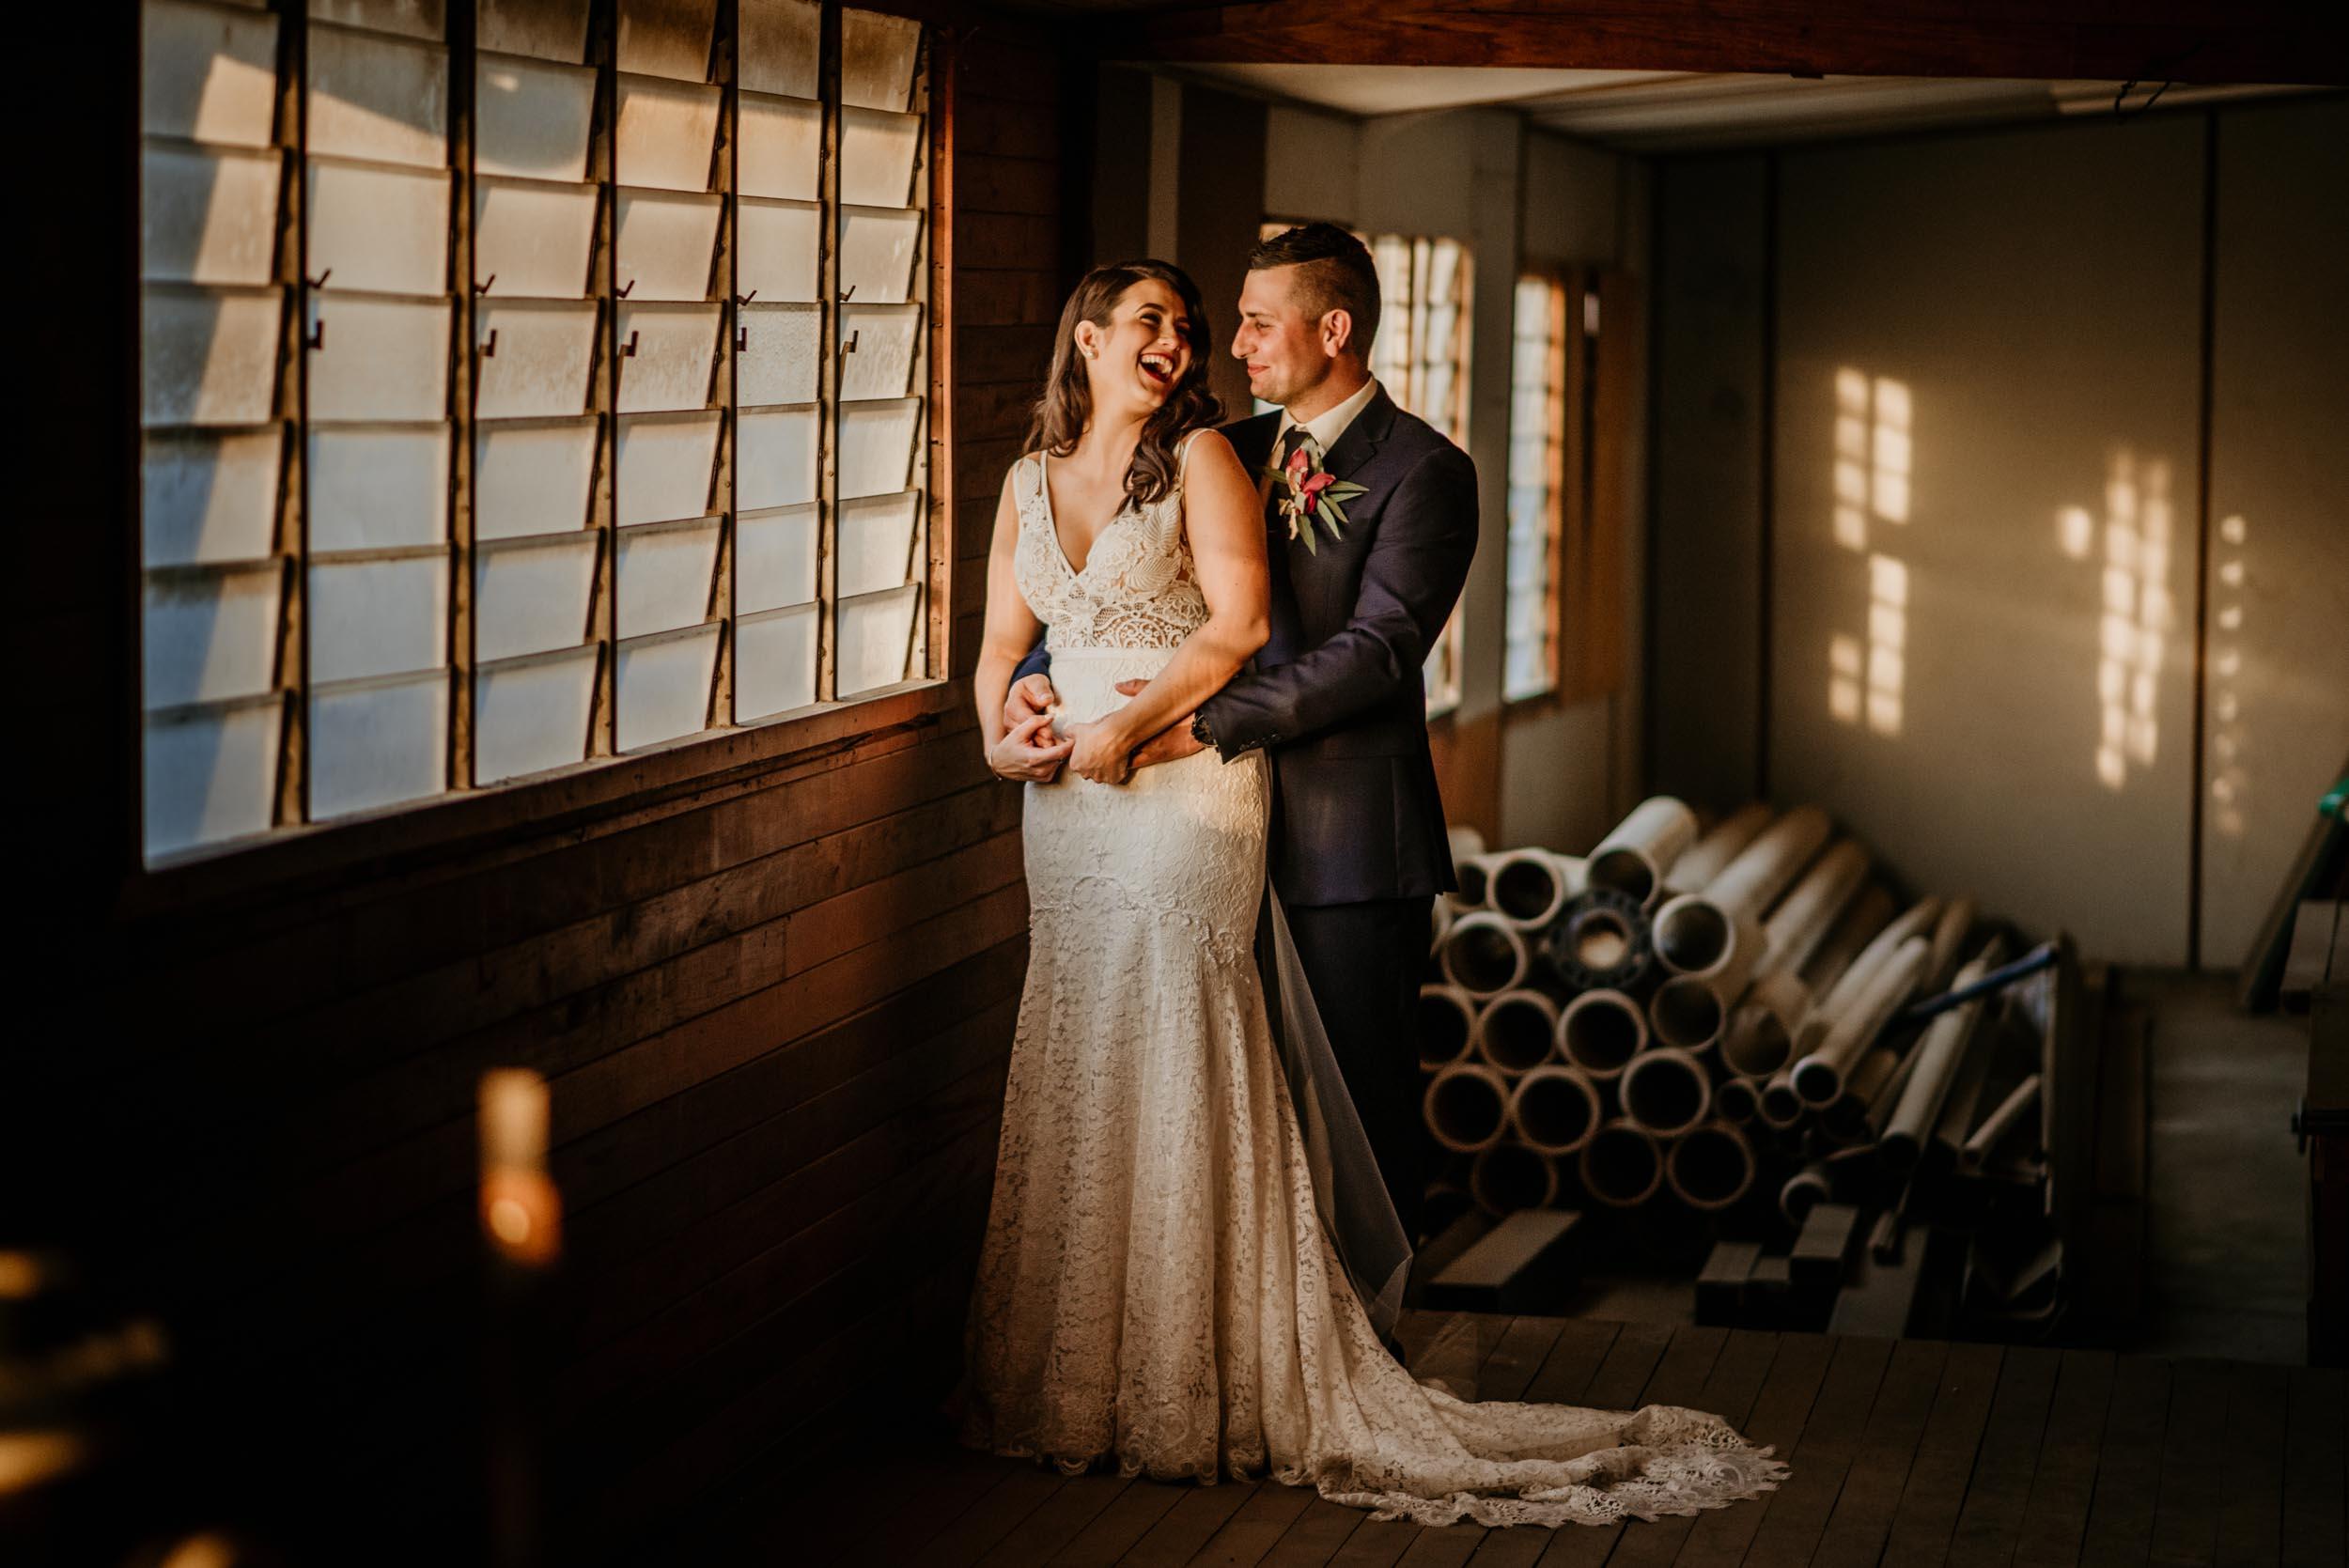 The Raw Photographer - Cairns Wedding Photographer - Atherton Tablelands - Mareeba farm Wedding - Irene Costa's Devine Bridal - Candid - Photo Package-45.jpg